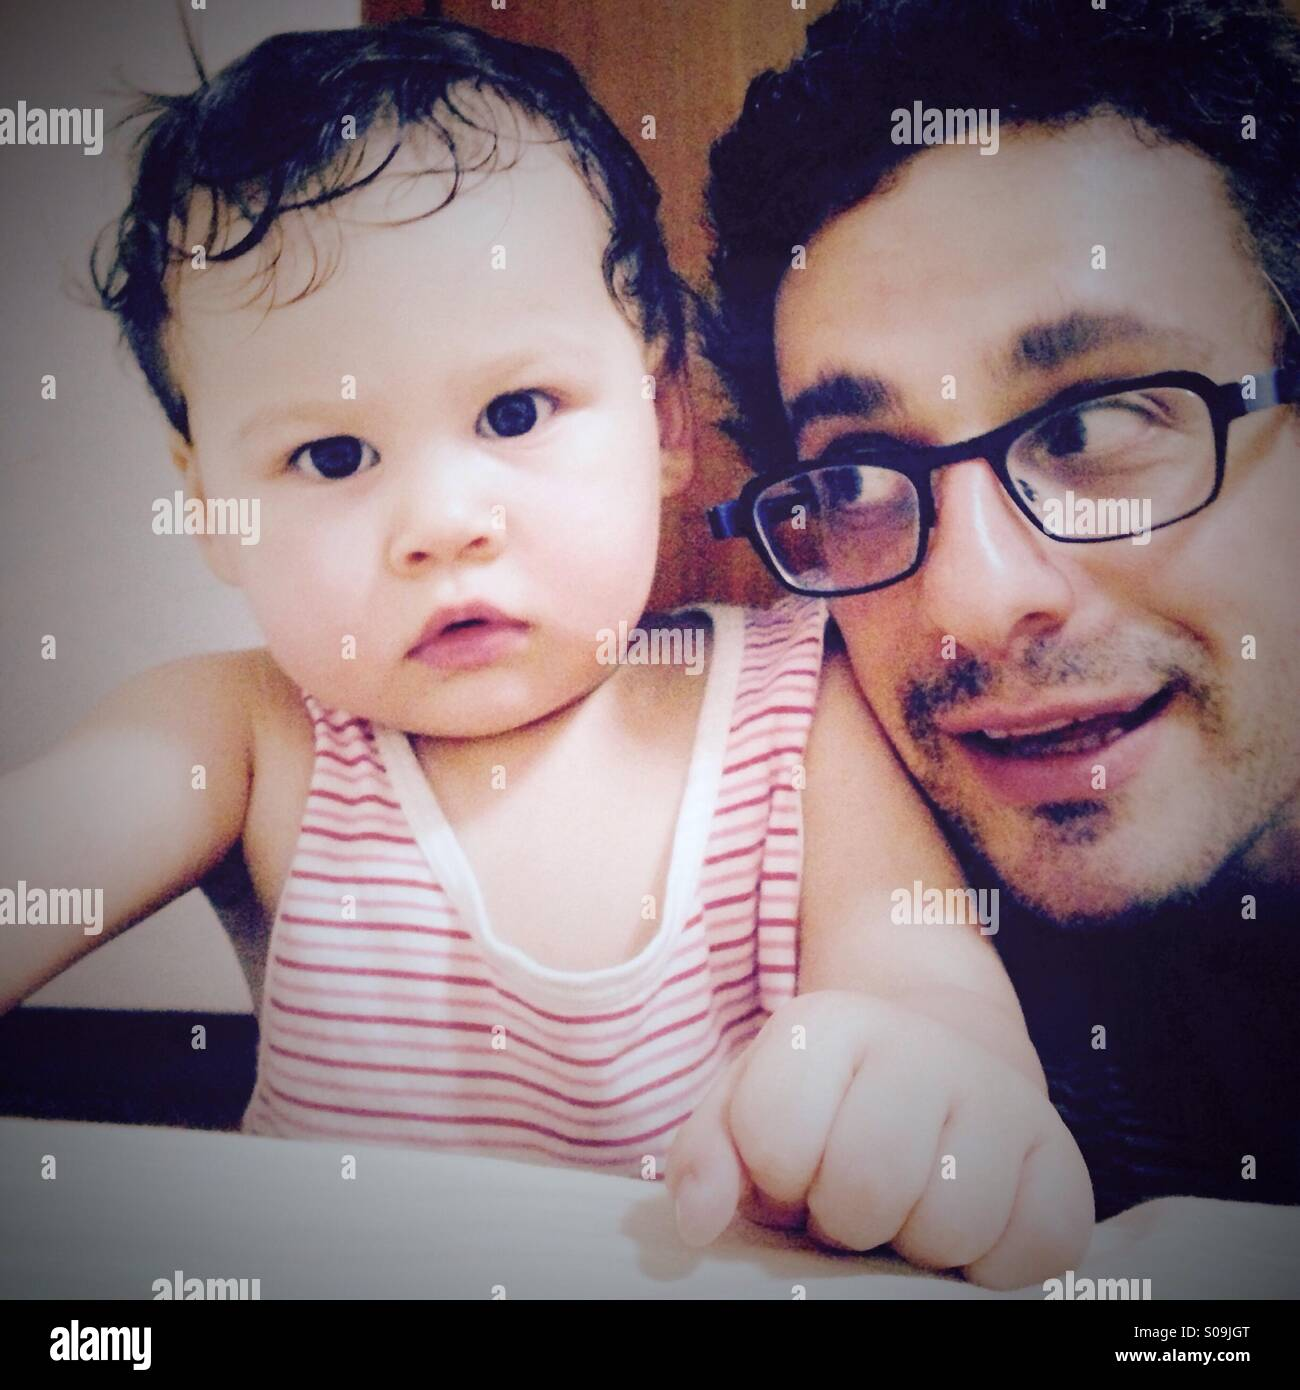 Vater und Tochter Auto-Porträt Stockbild